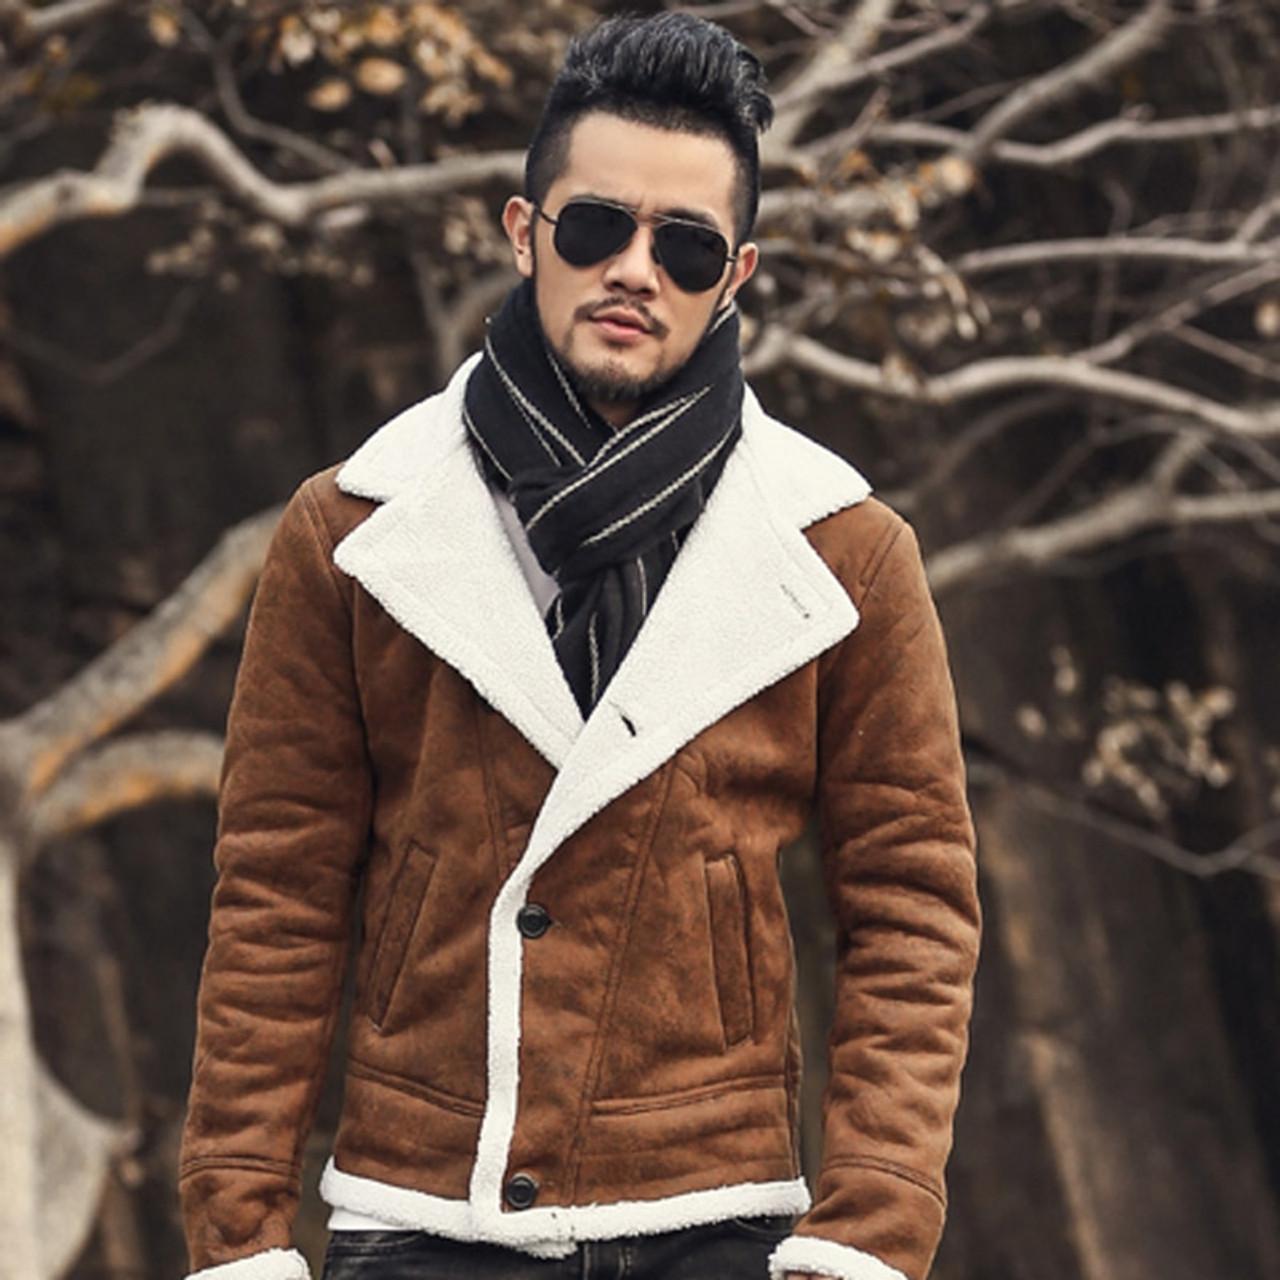 8568883deaa1 ... 2018 Autumn vintage old leather jacket men wool lining men warm fur  collar jacket Mens Faux ...